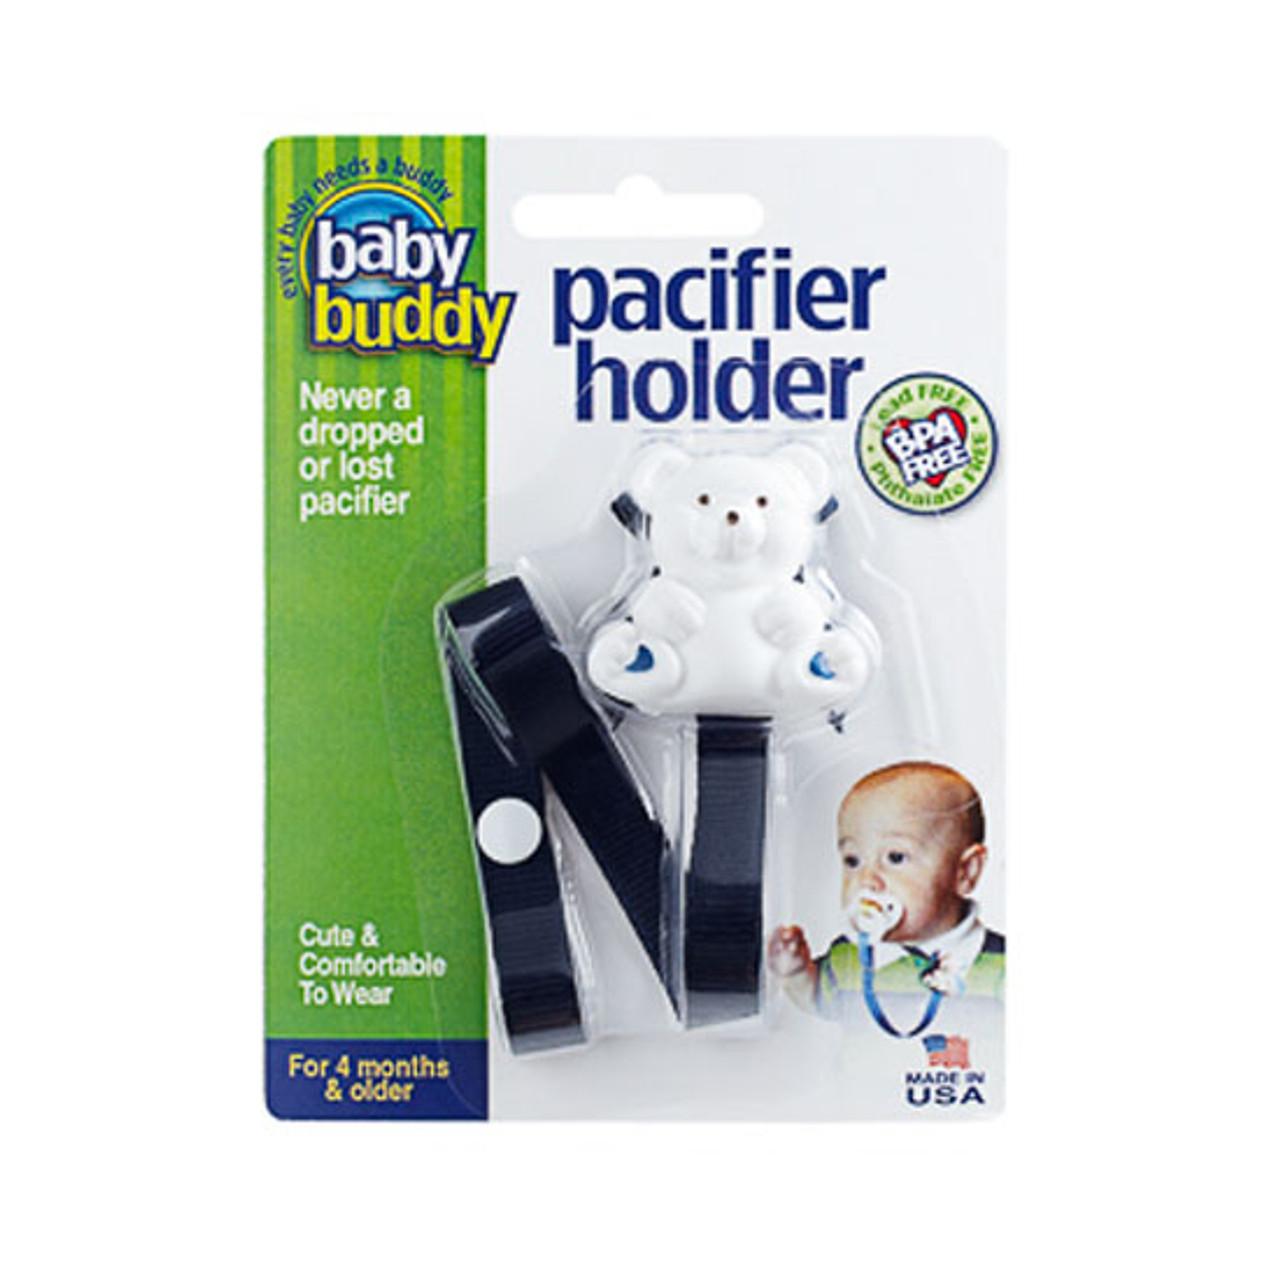 Baby Buddy Universal Pacifier Holder Beach Blanket